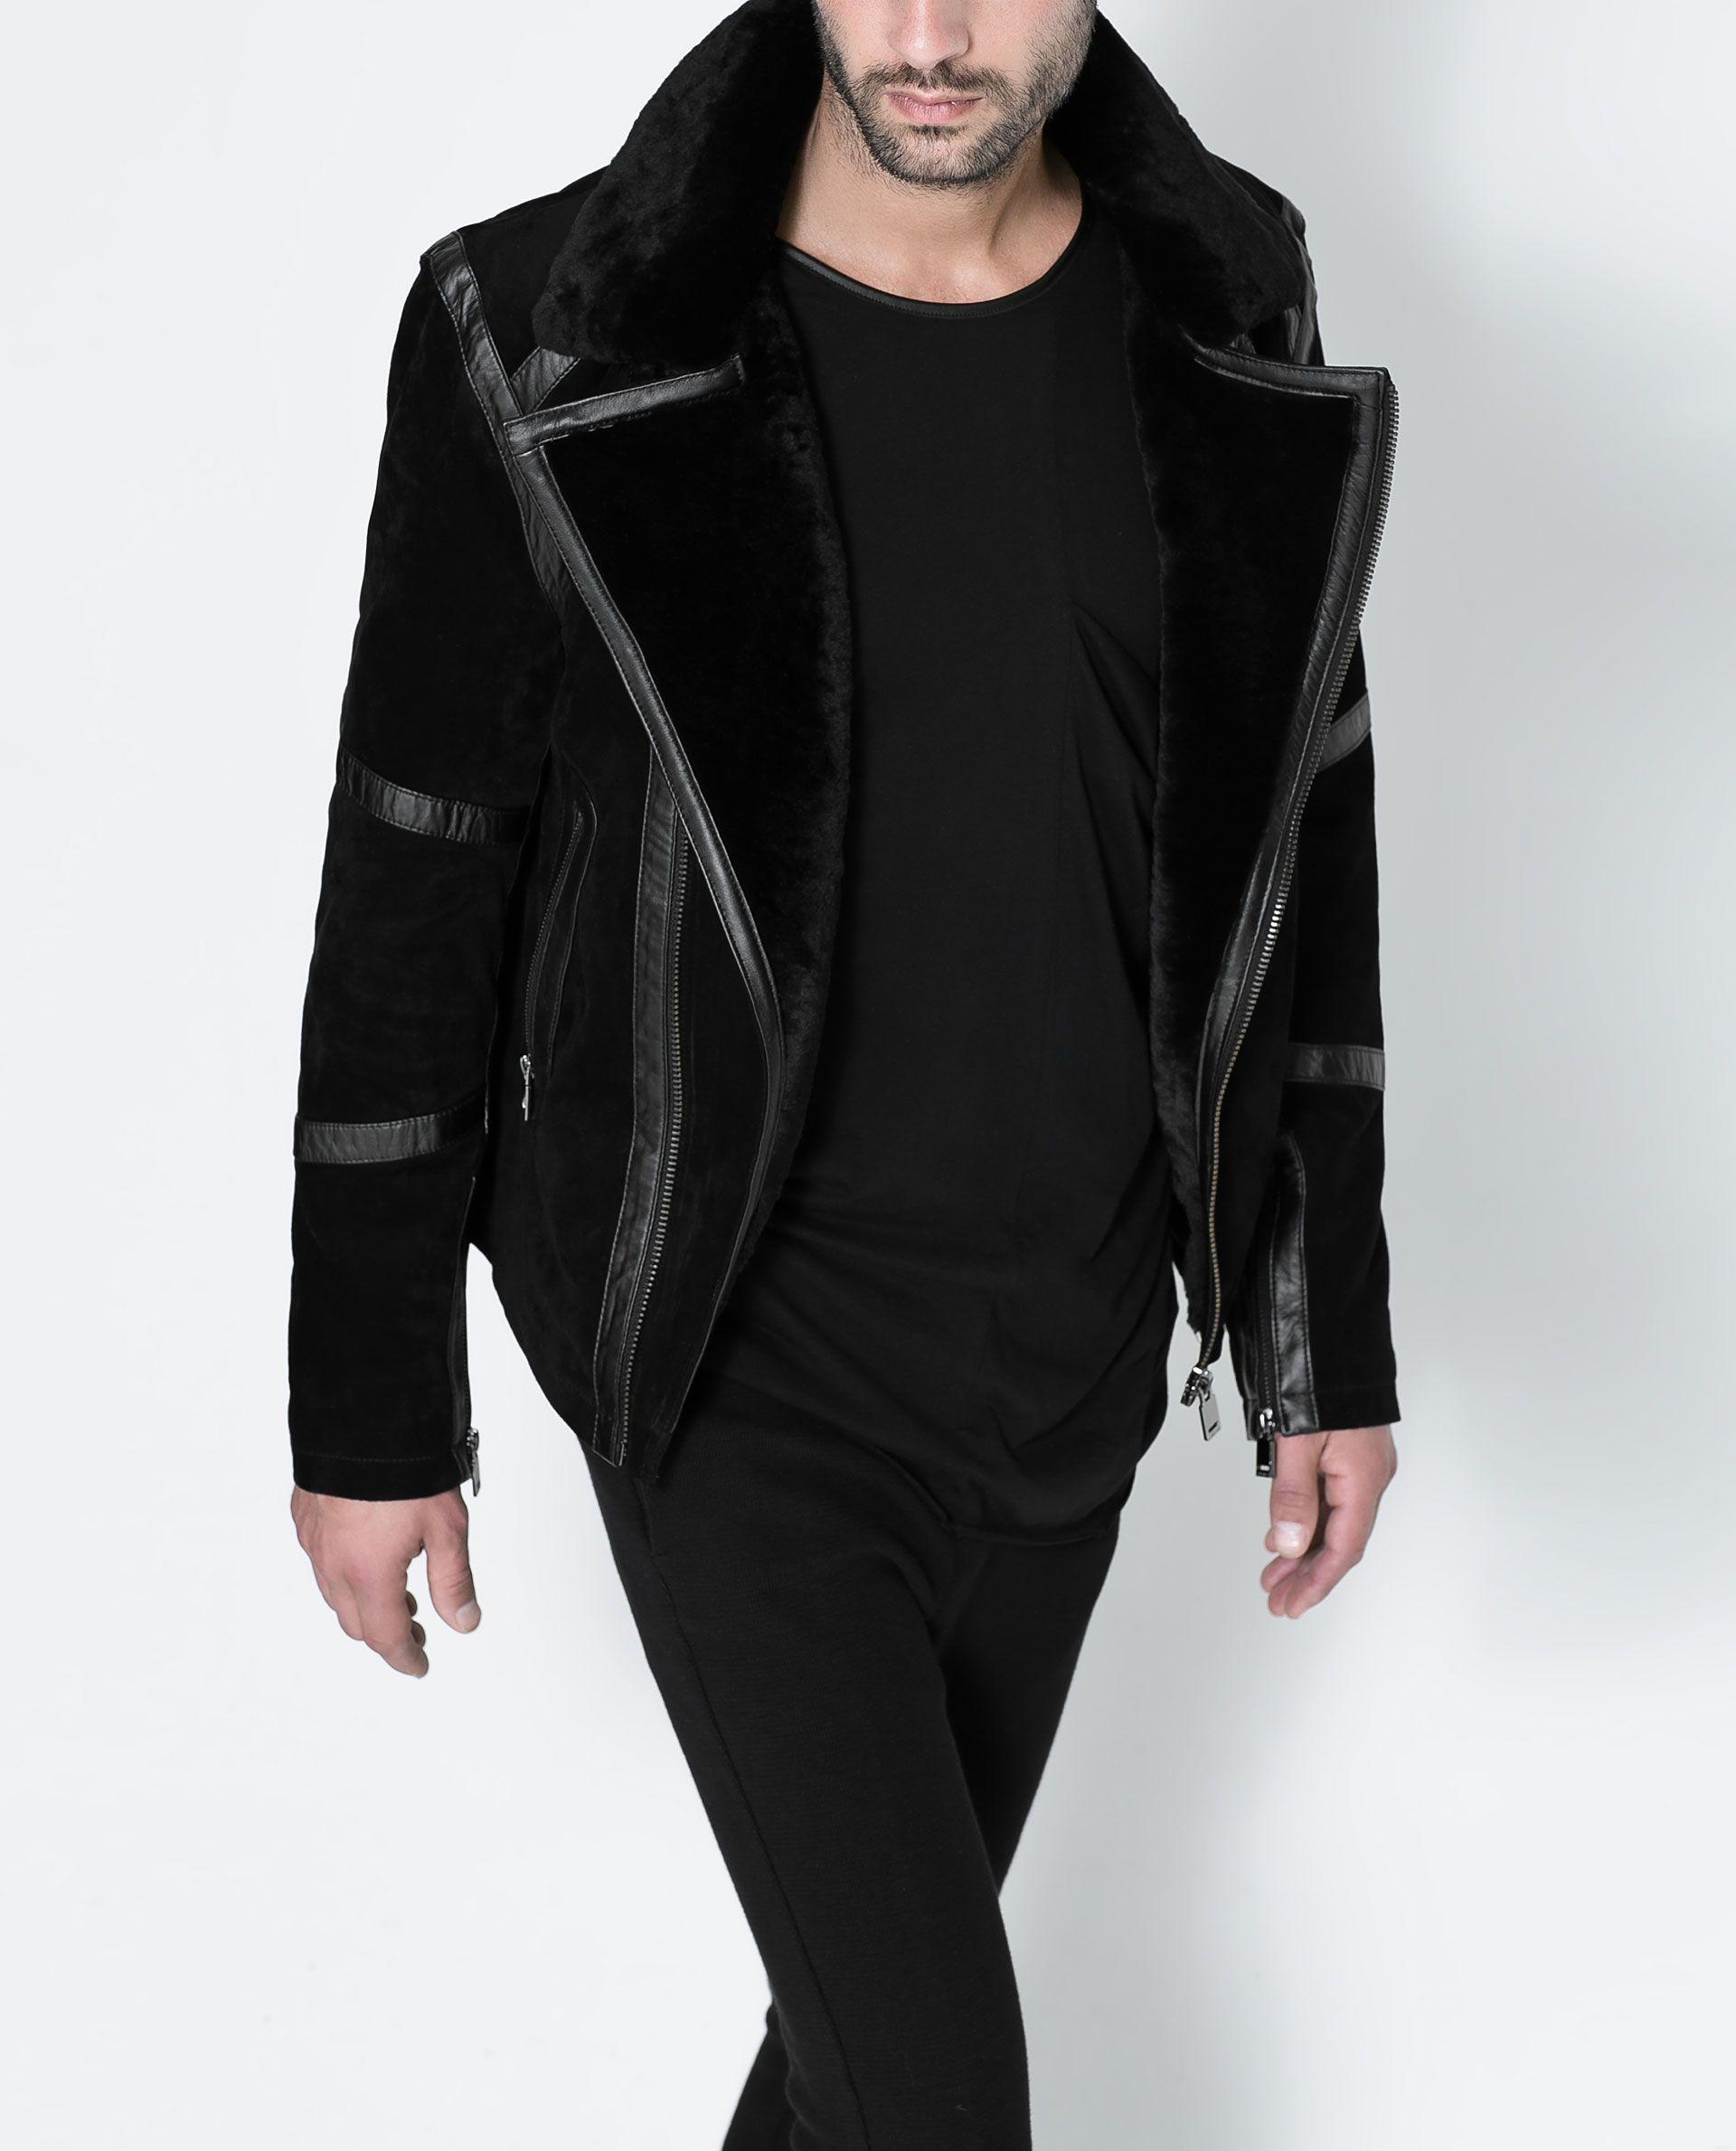 Zara men Zara man leather jacket, Custom leather jackets